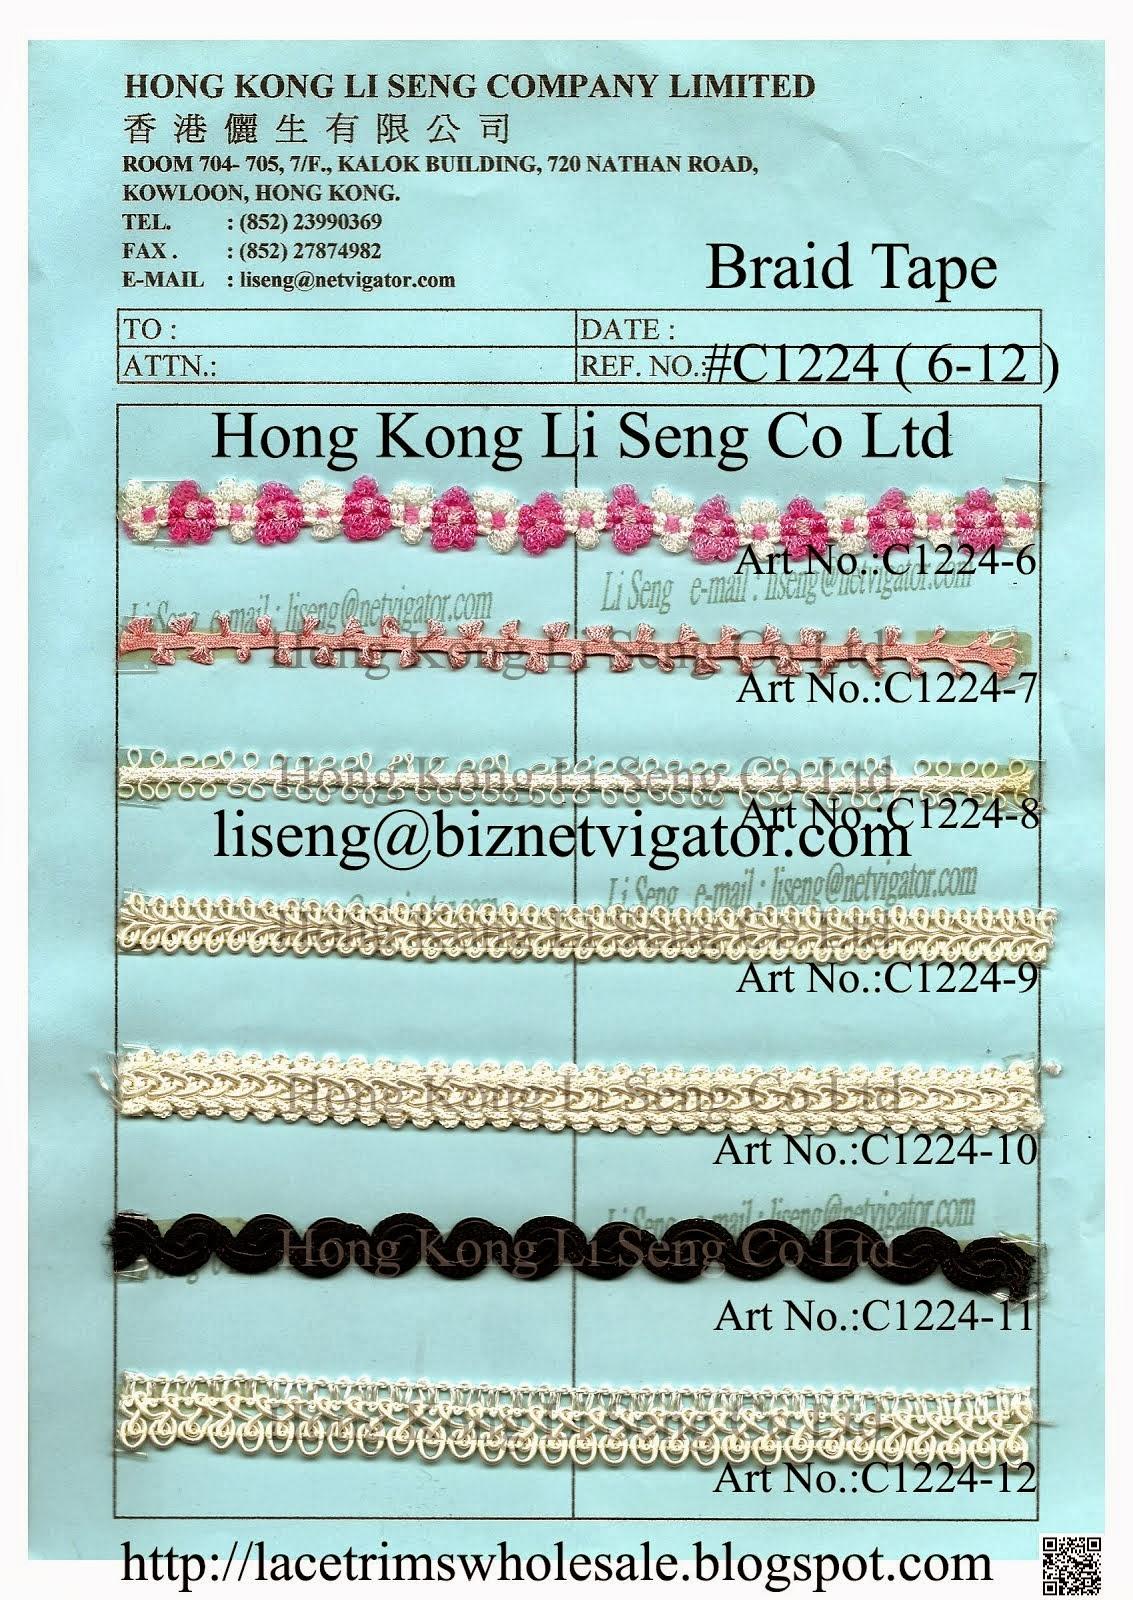 Braid Tape Wholesale and Supplier - Hong Kong Li Seng Co Ltd